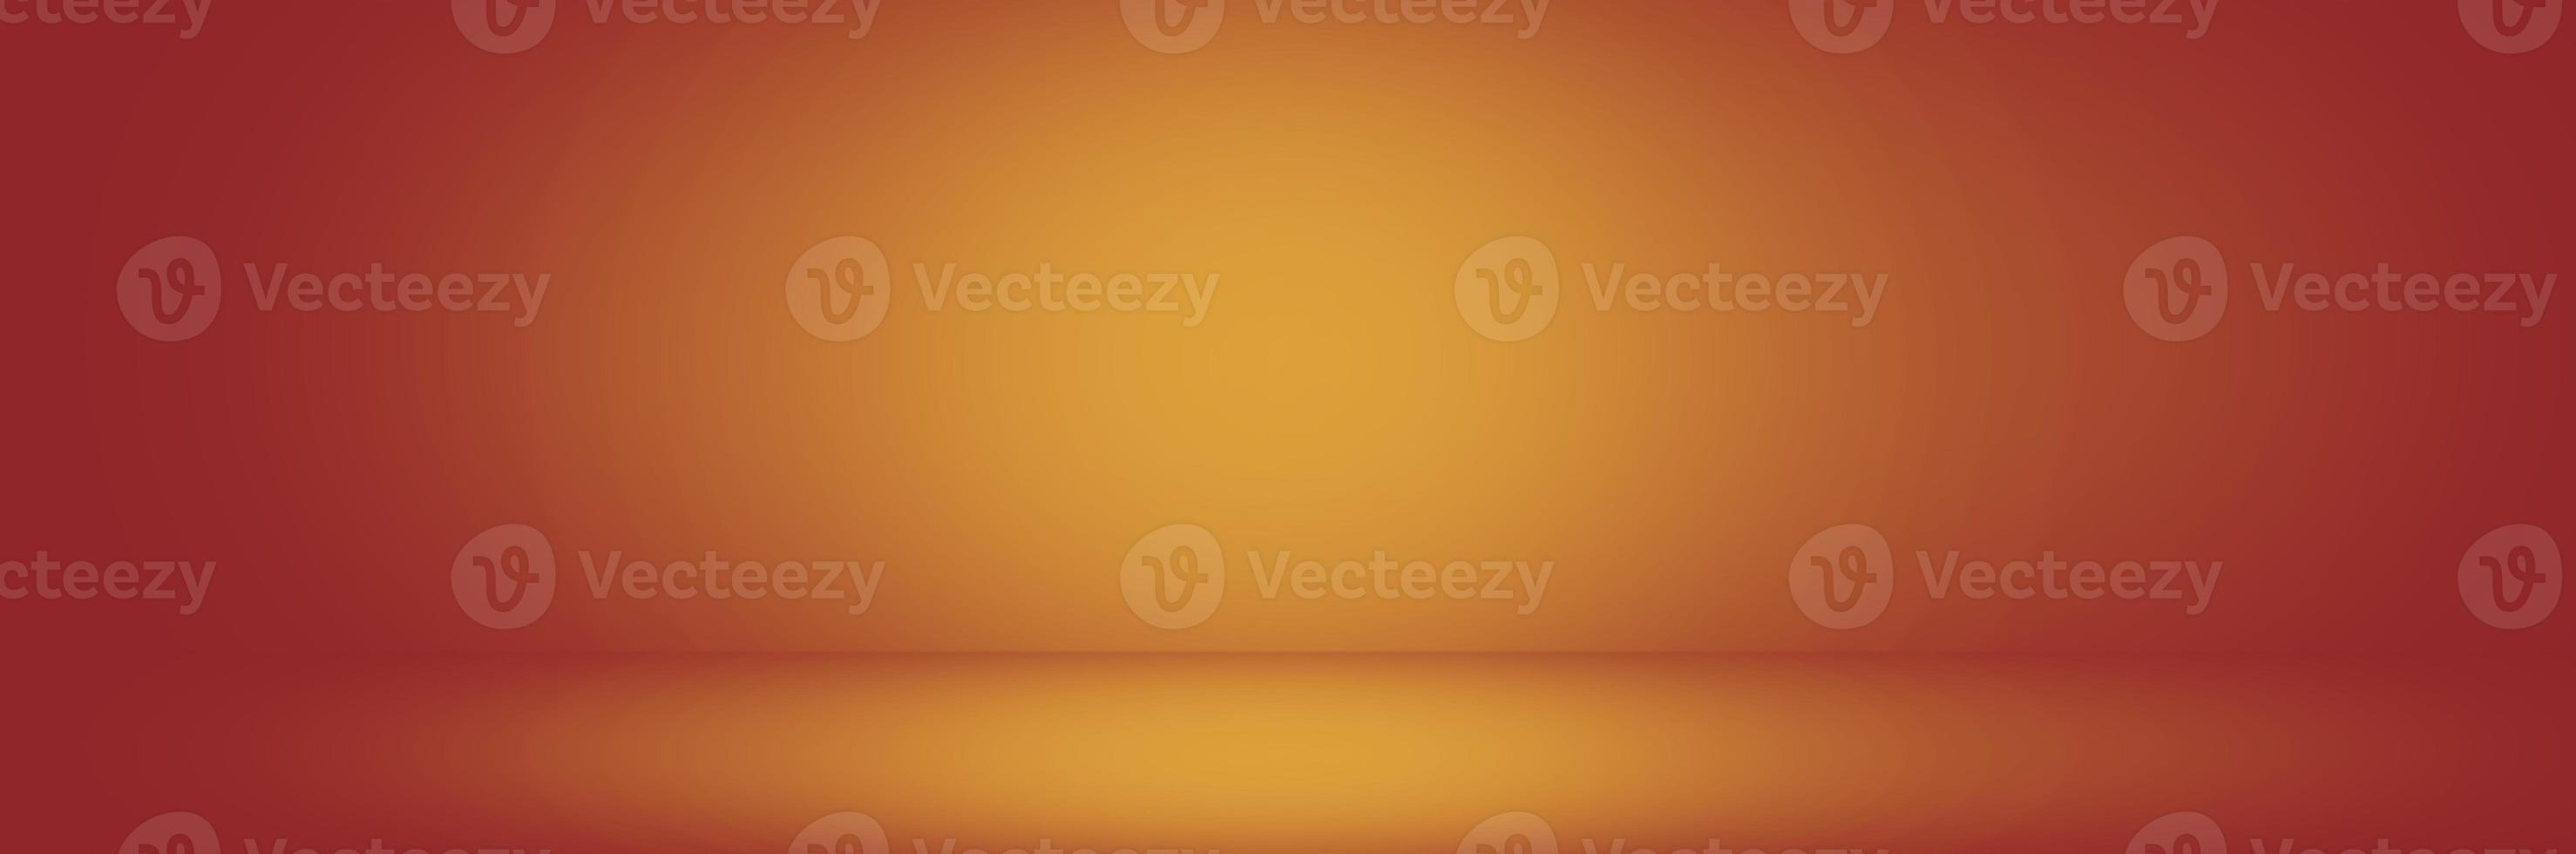 orange och gul studiobakgrundsbanderoll, tonad bakgrund foto